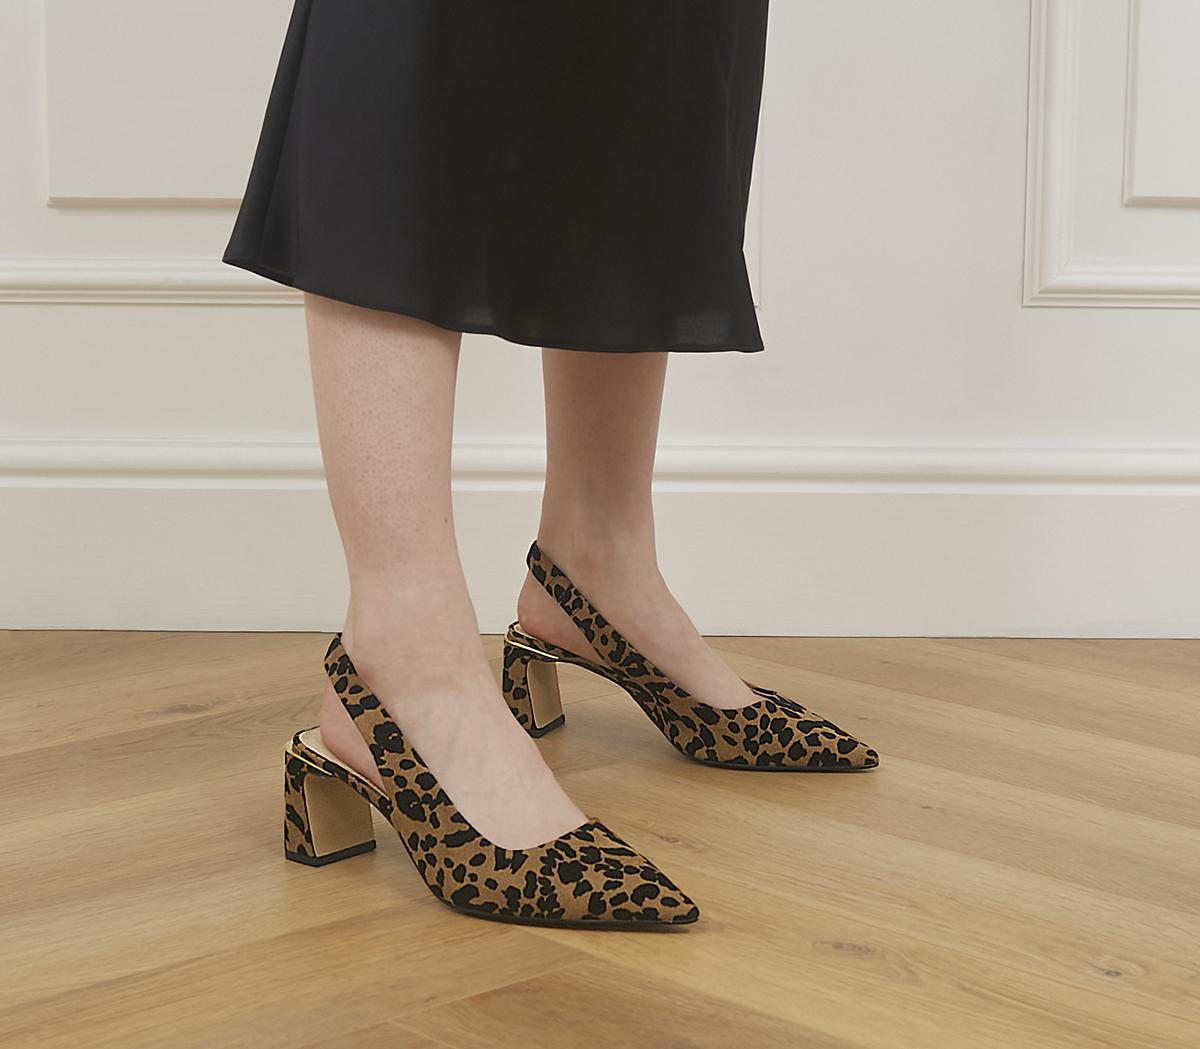 Malvern Pointed Toe Court Sling Back Heels